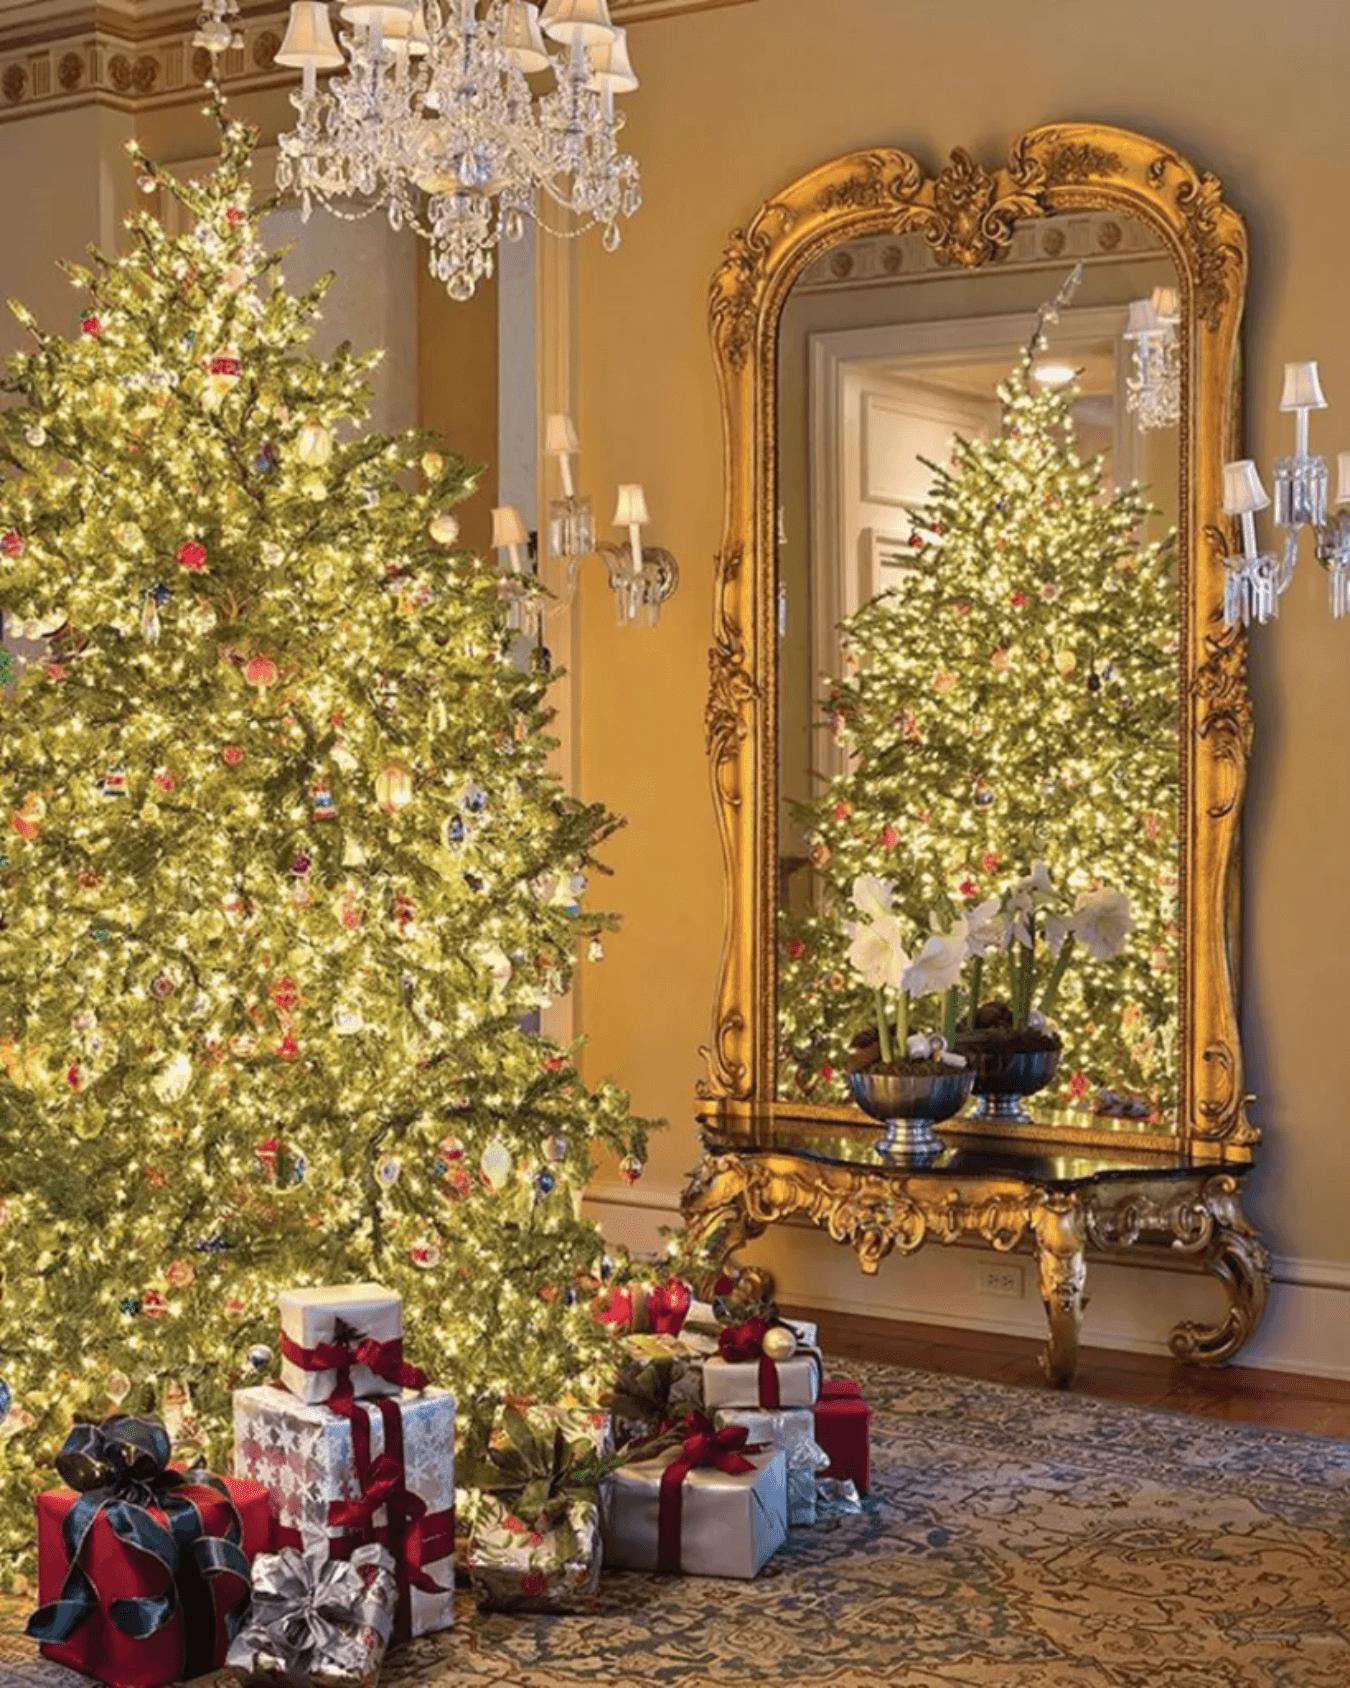 Anne White Interiors Blog   5 tips for a no-fuss stylish Christmas season